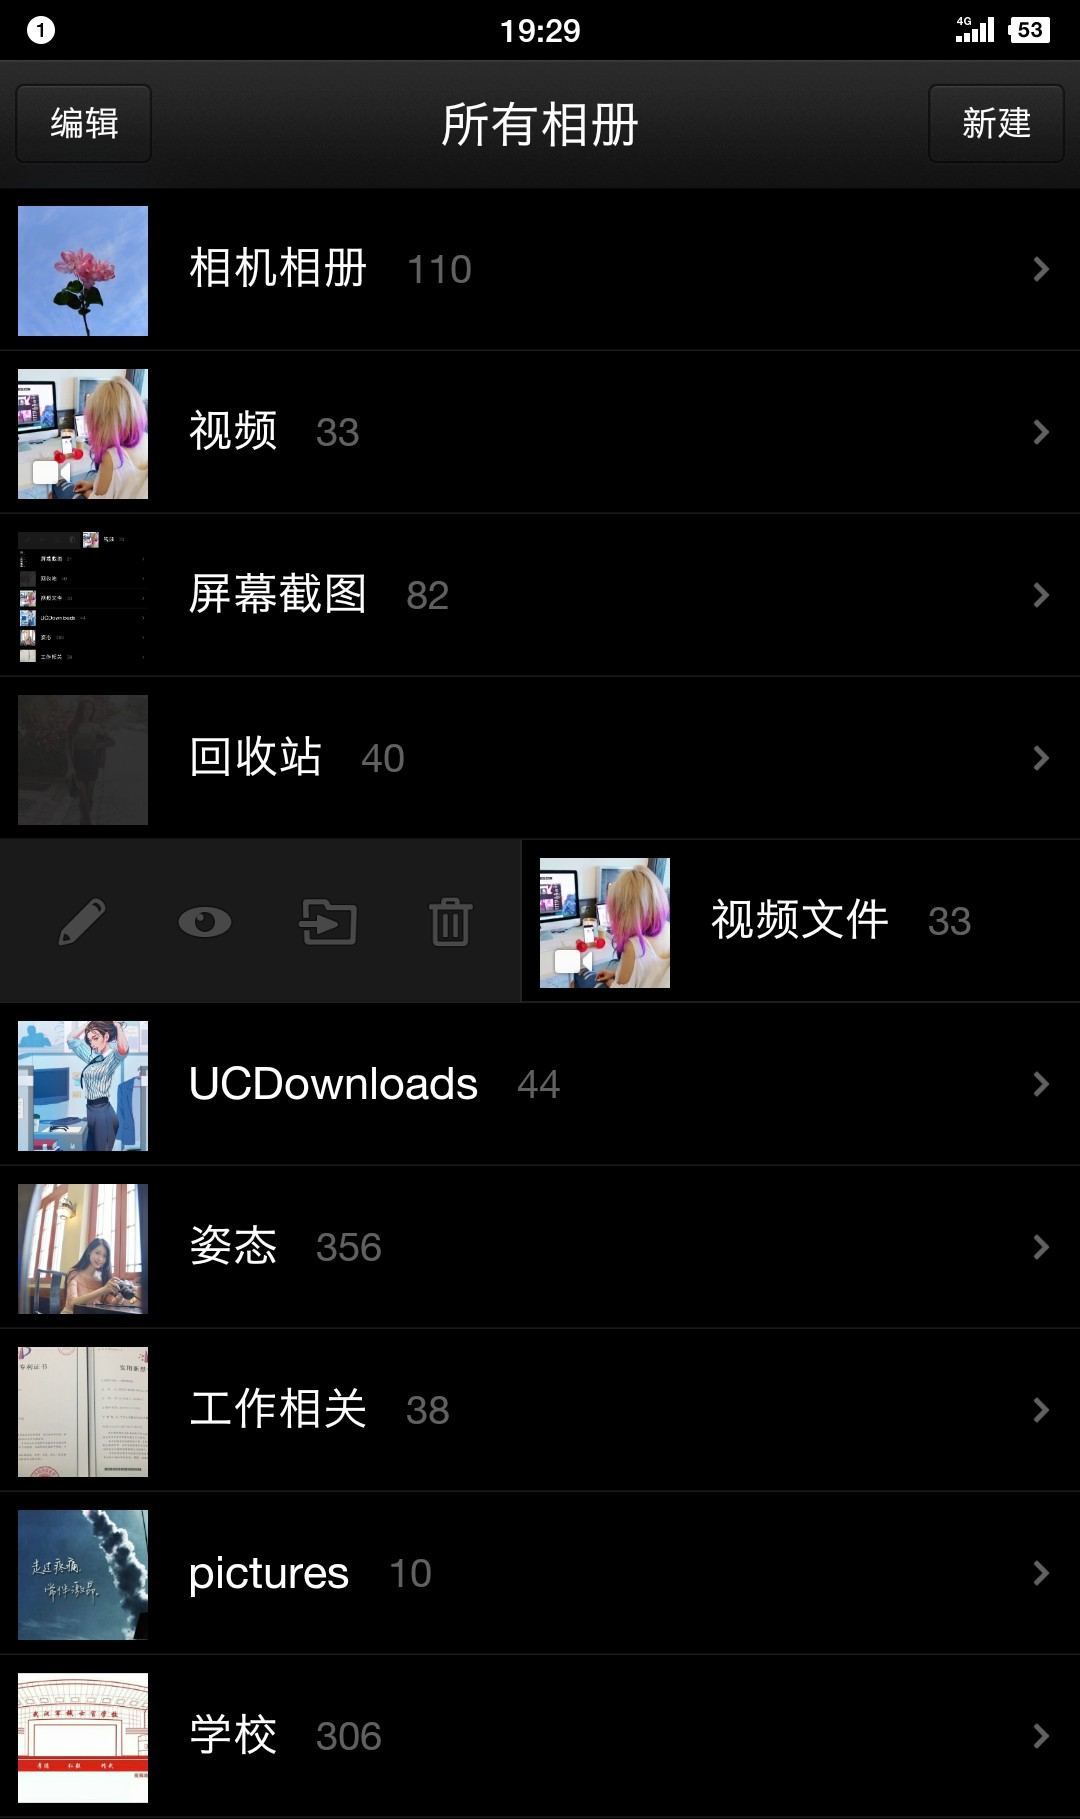 Screenshot_2017-11-23-19-29-53-222_??.png